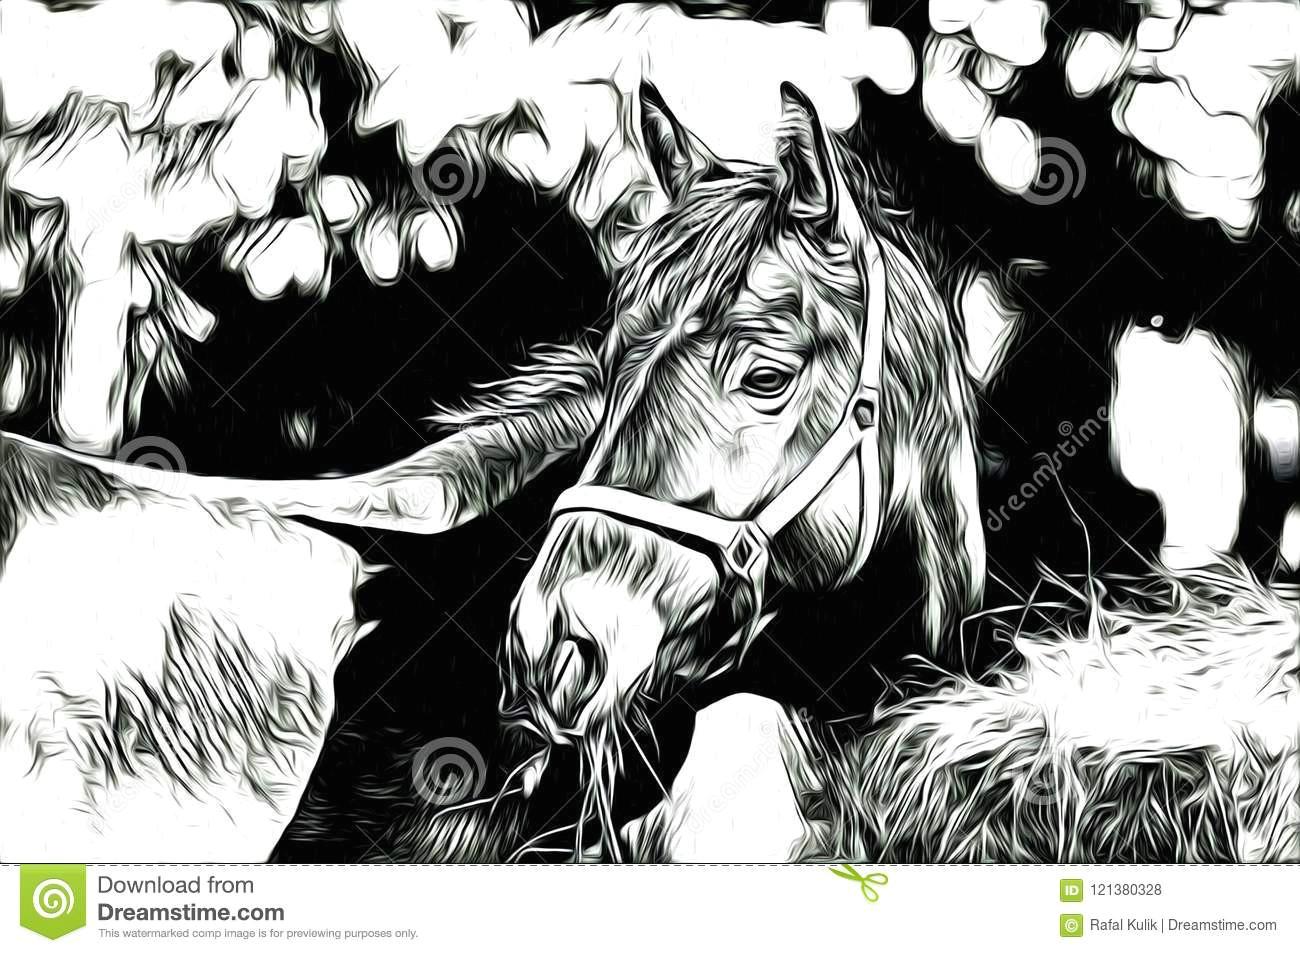 ffreehand horse head art design design illustration good for any design a very funny illustration